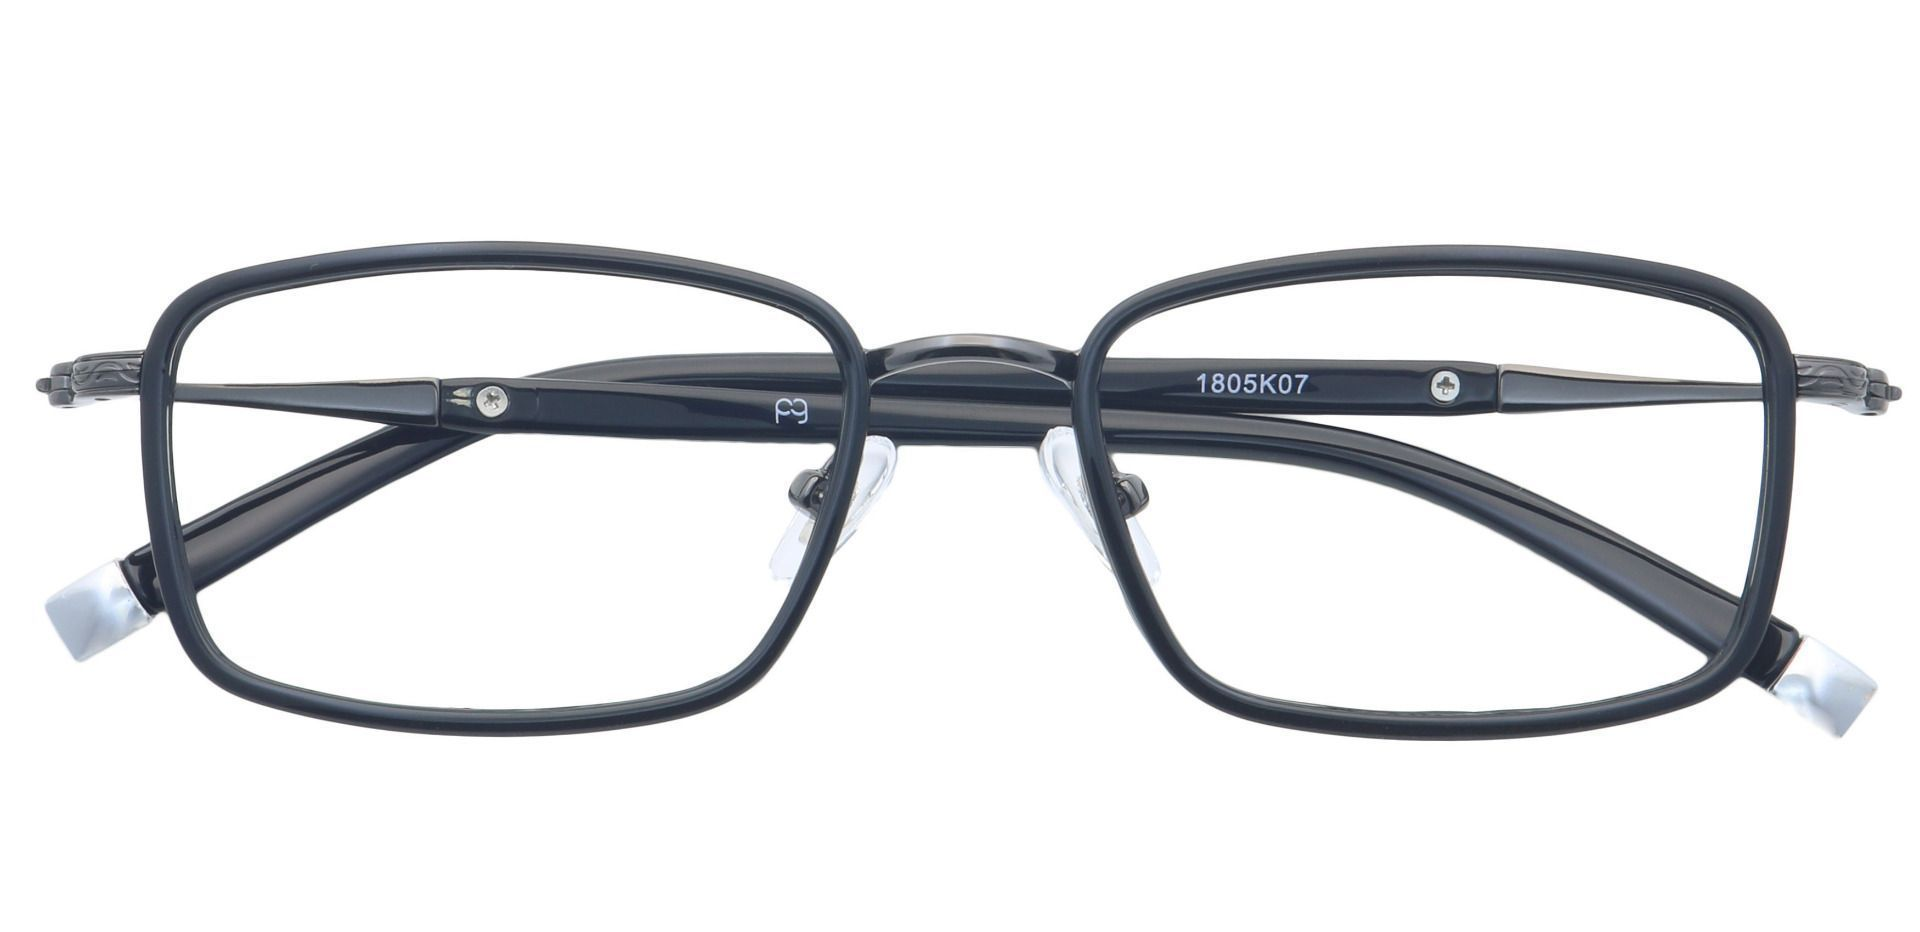 Tiller Square Prescription Glasses - Black